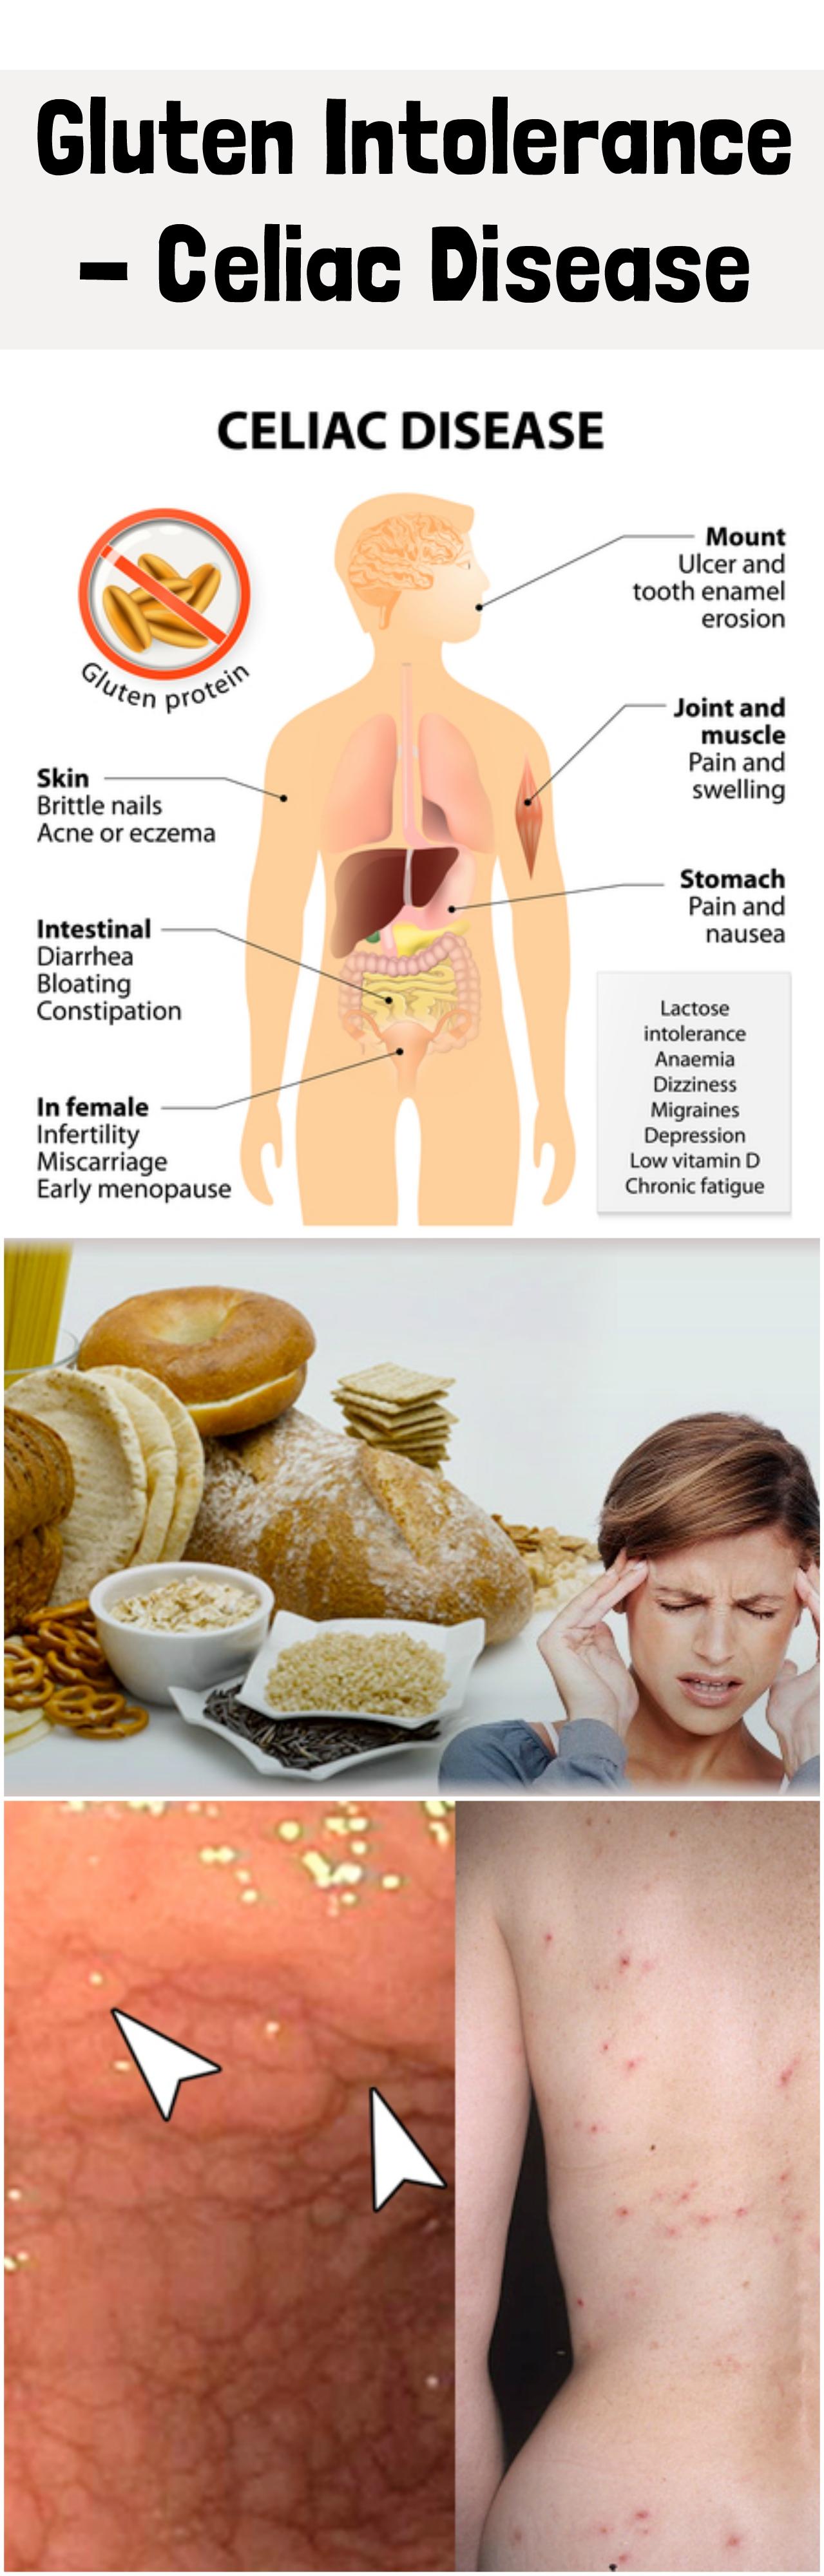 Gluten Intolerance - Celiac Disease | Celiac disease ...